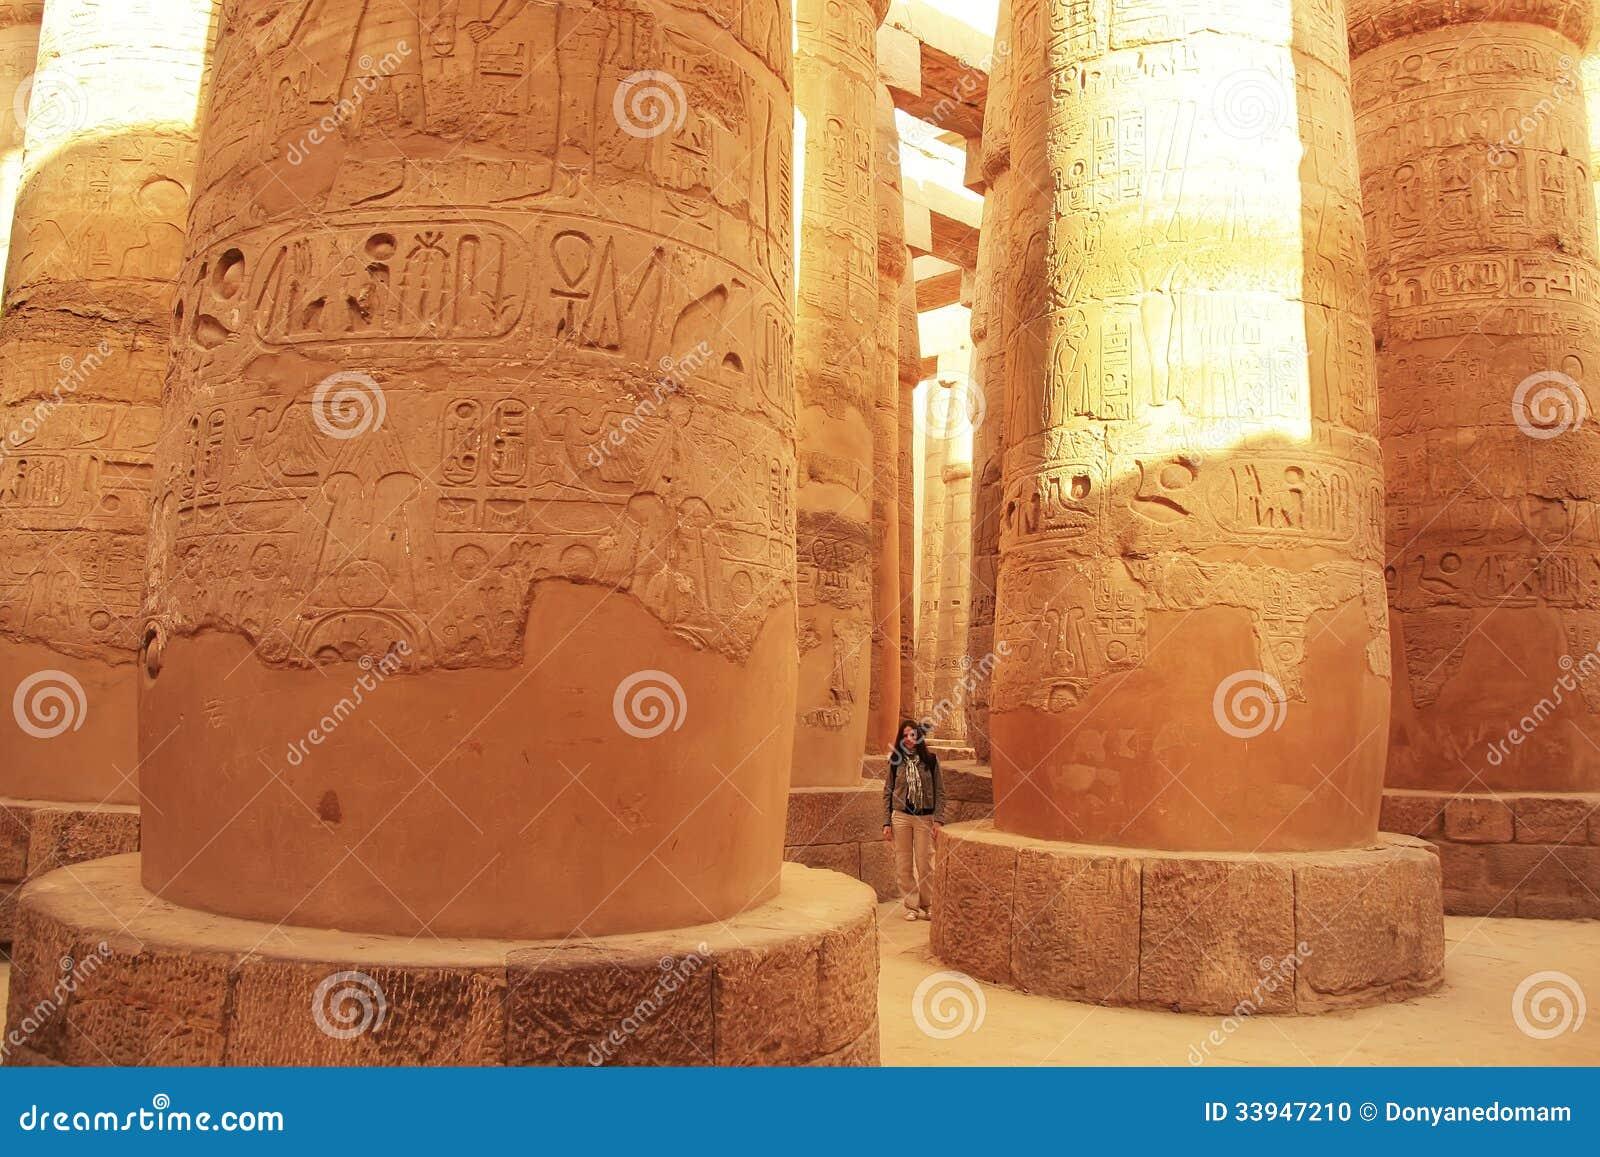 Grote Hypostyle Zaal, Karnak-complexe tempel, Luxor